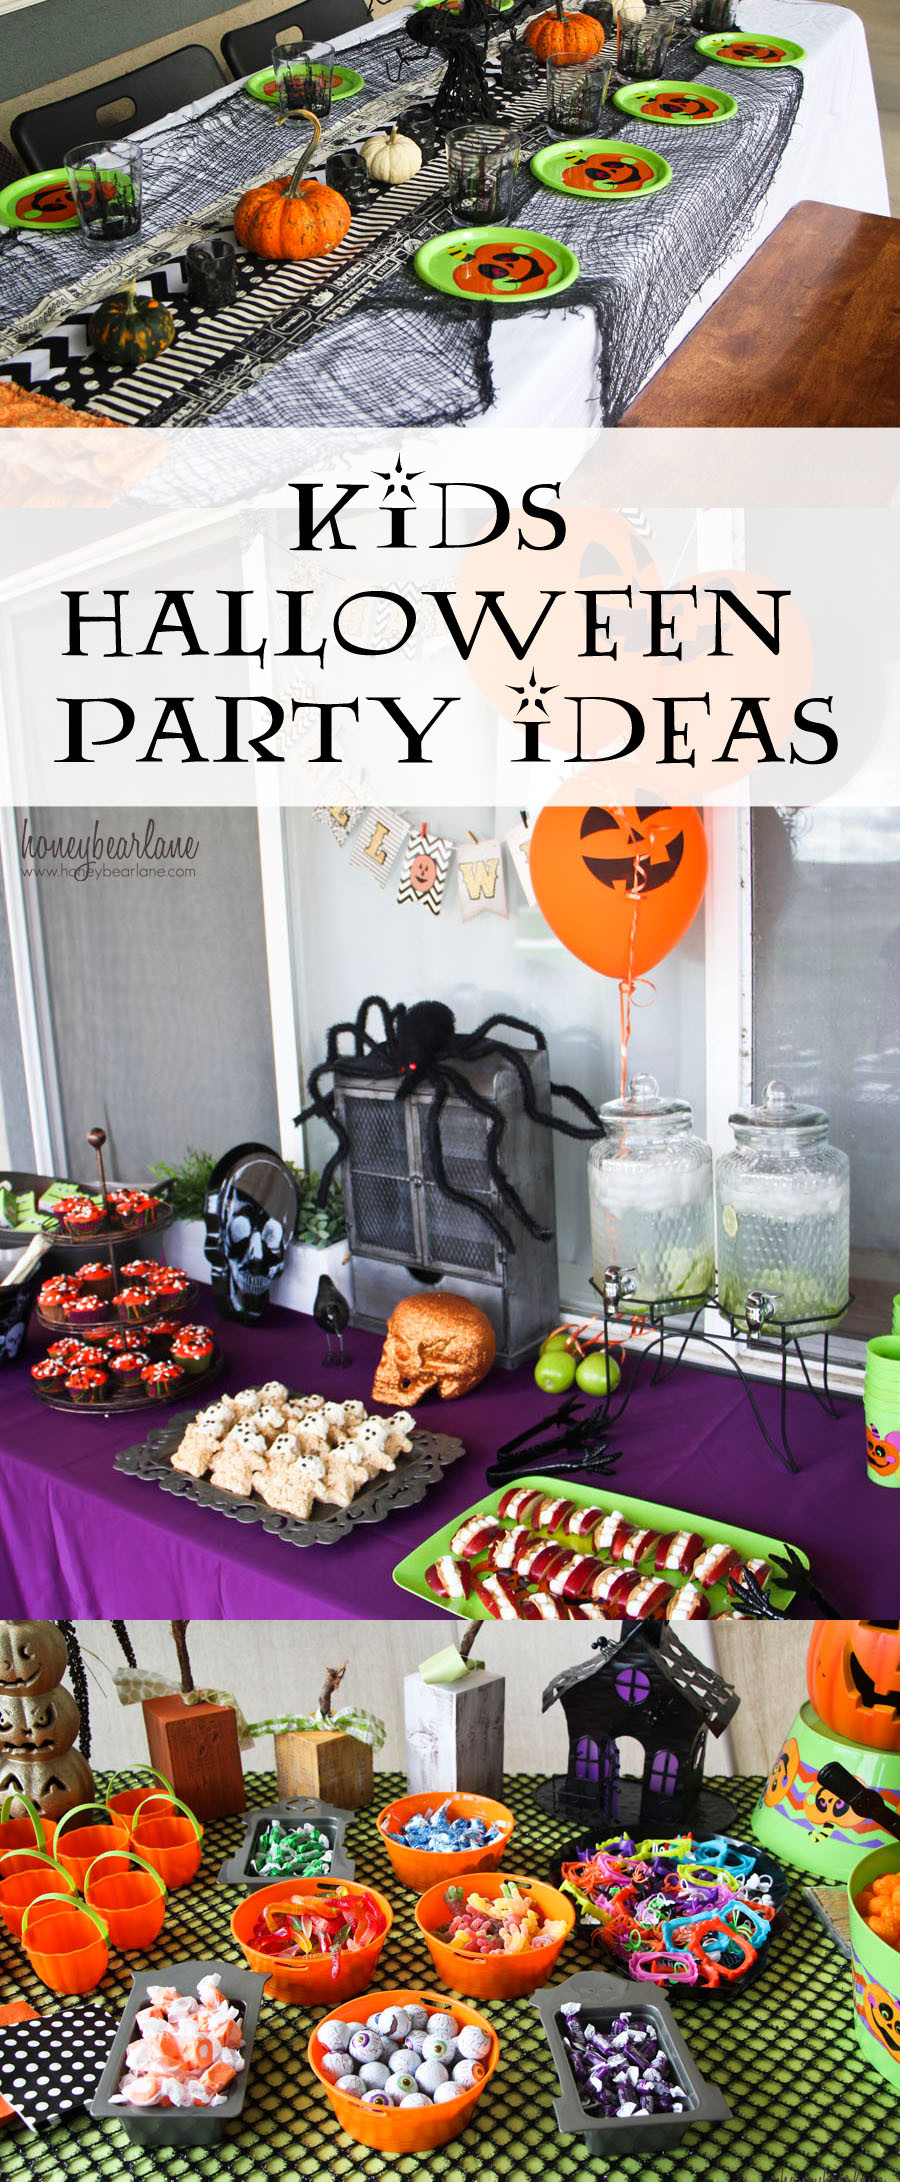 Funny Halloween Party Ideas  Kids Halloween Party Ideas Honeybear Lane